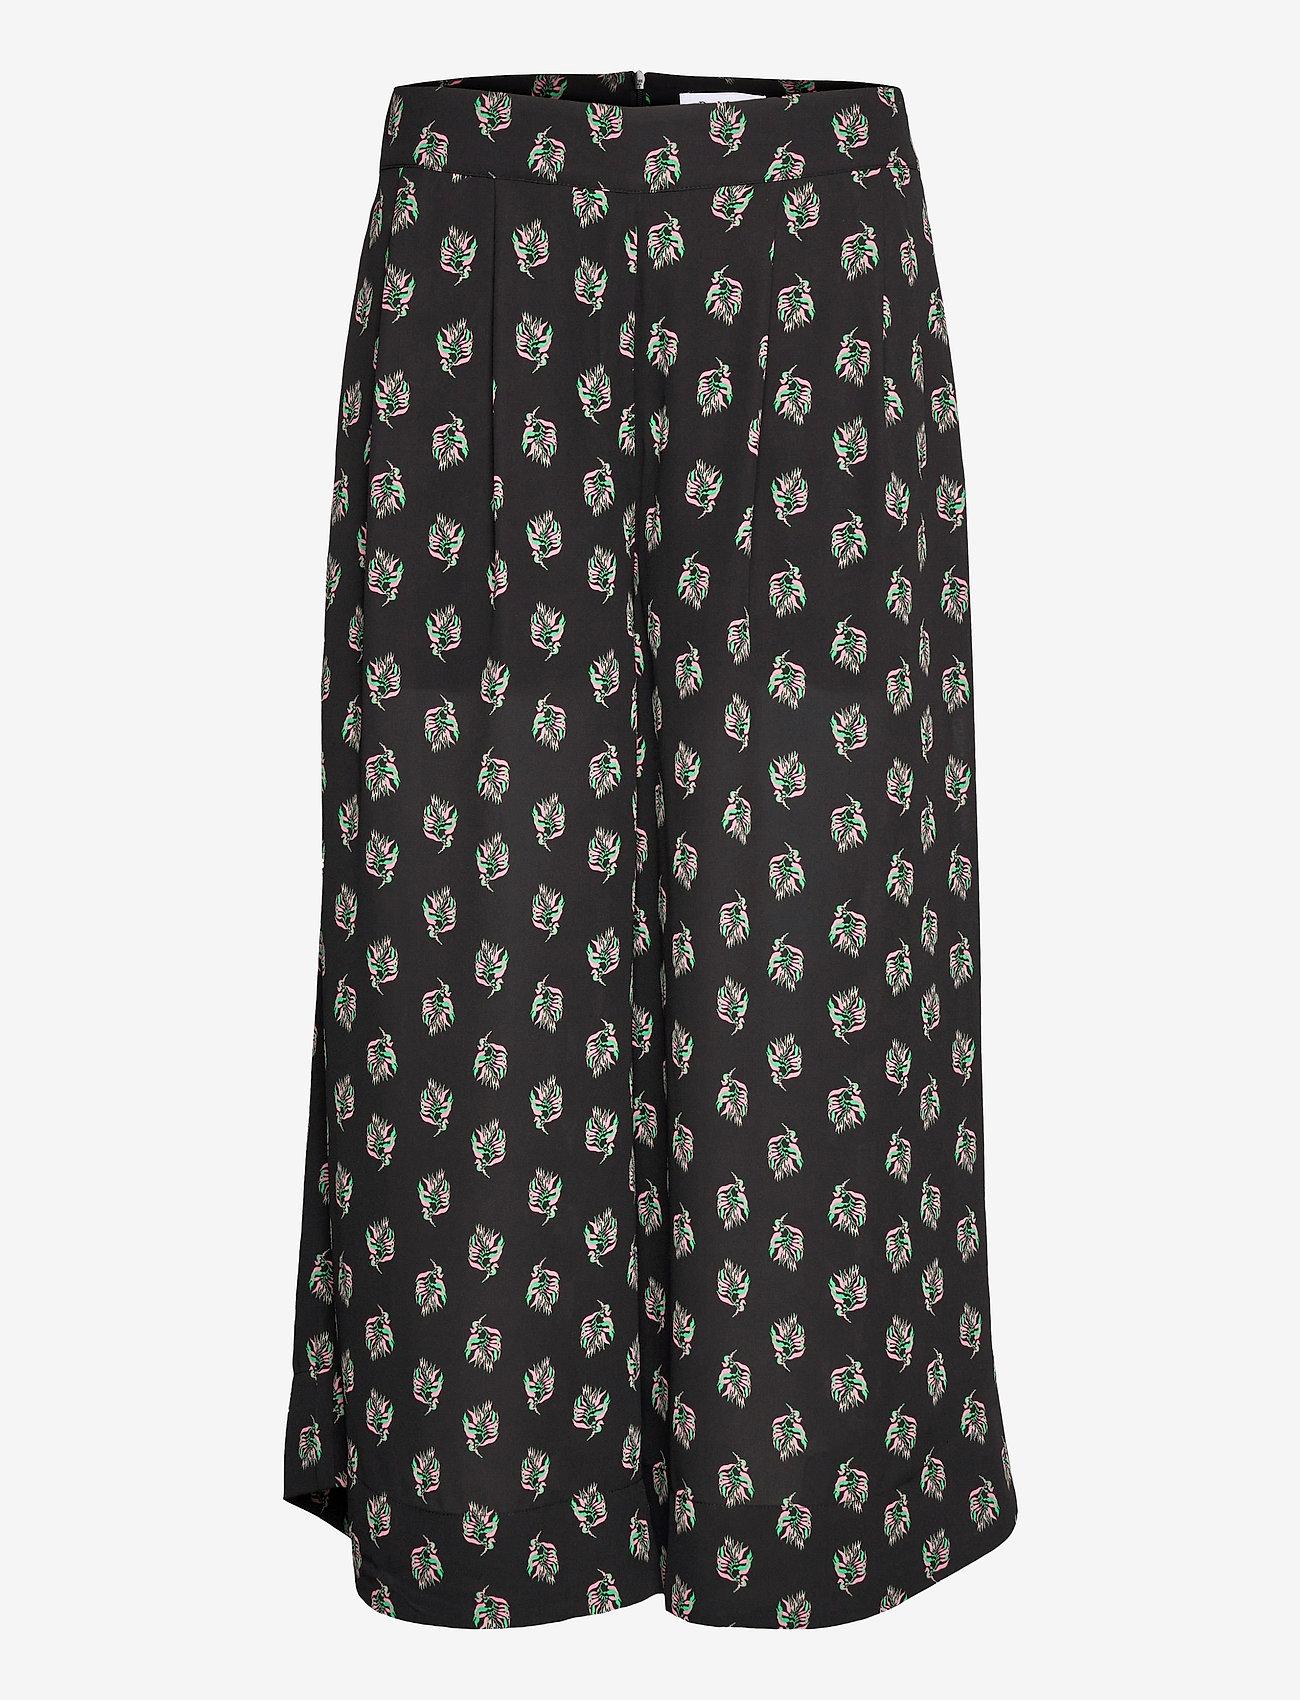 RODEBJER - RODEBJER ORINA - bukser med brede ben - black - 0